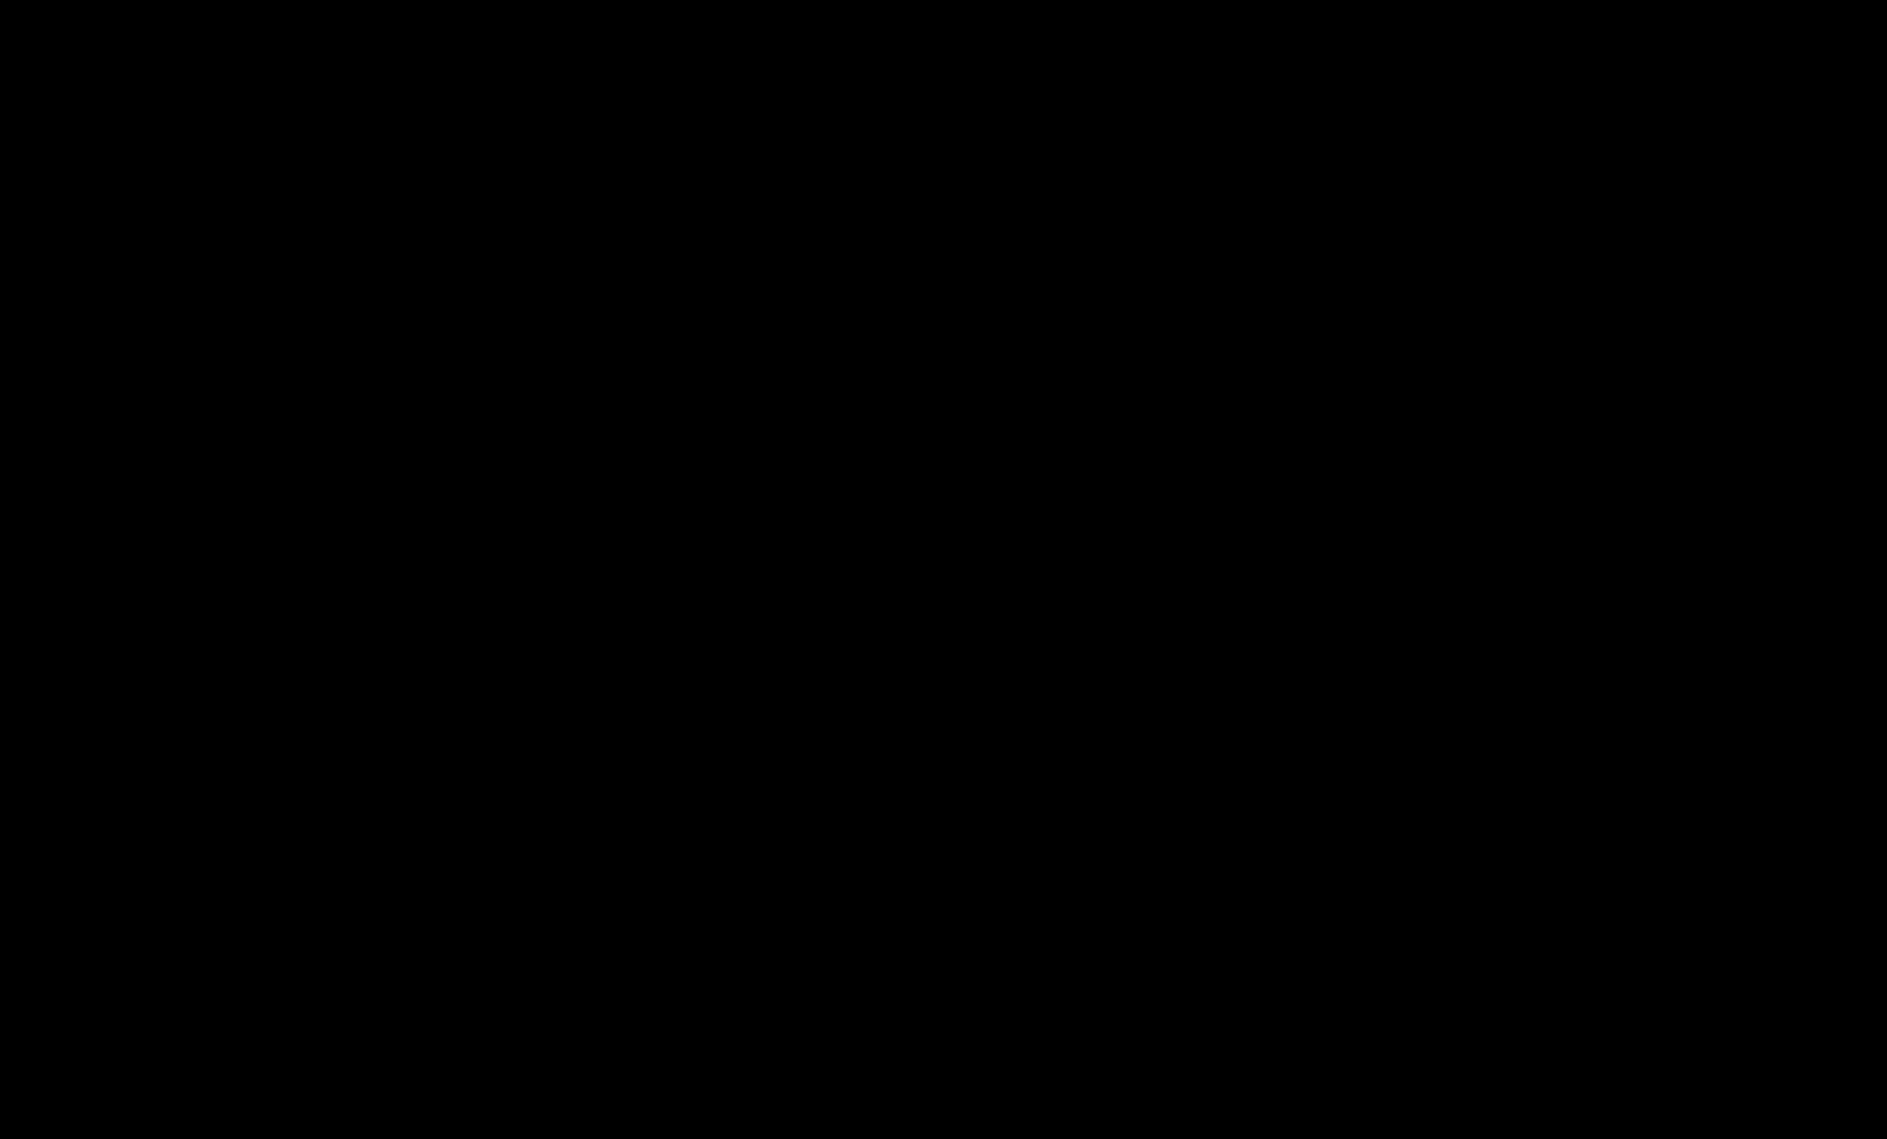 MATERIKA // AVANT-GARDE MATERIALS AND DESIGNS